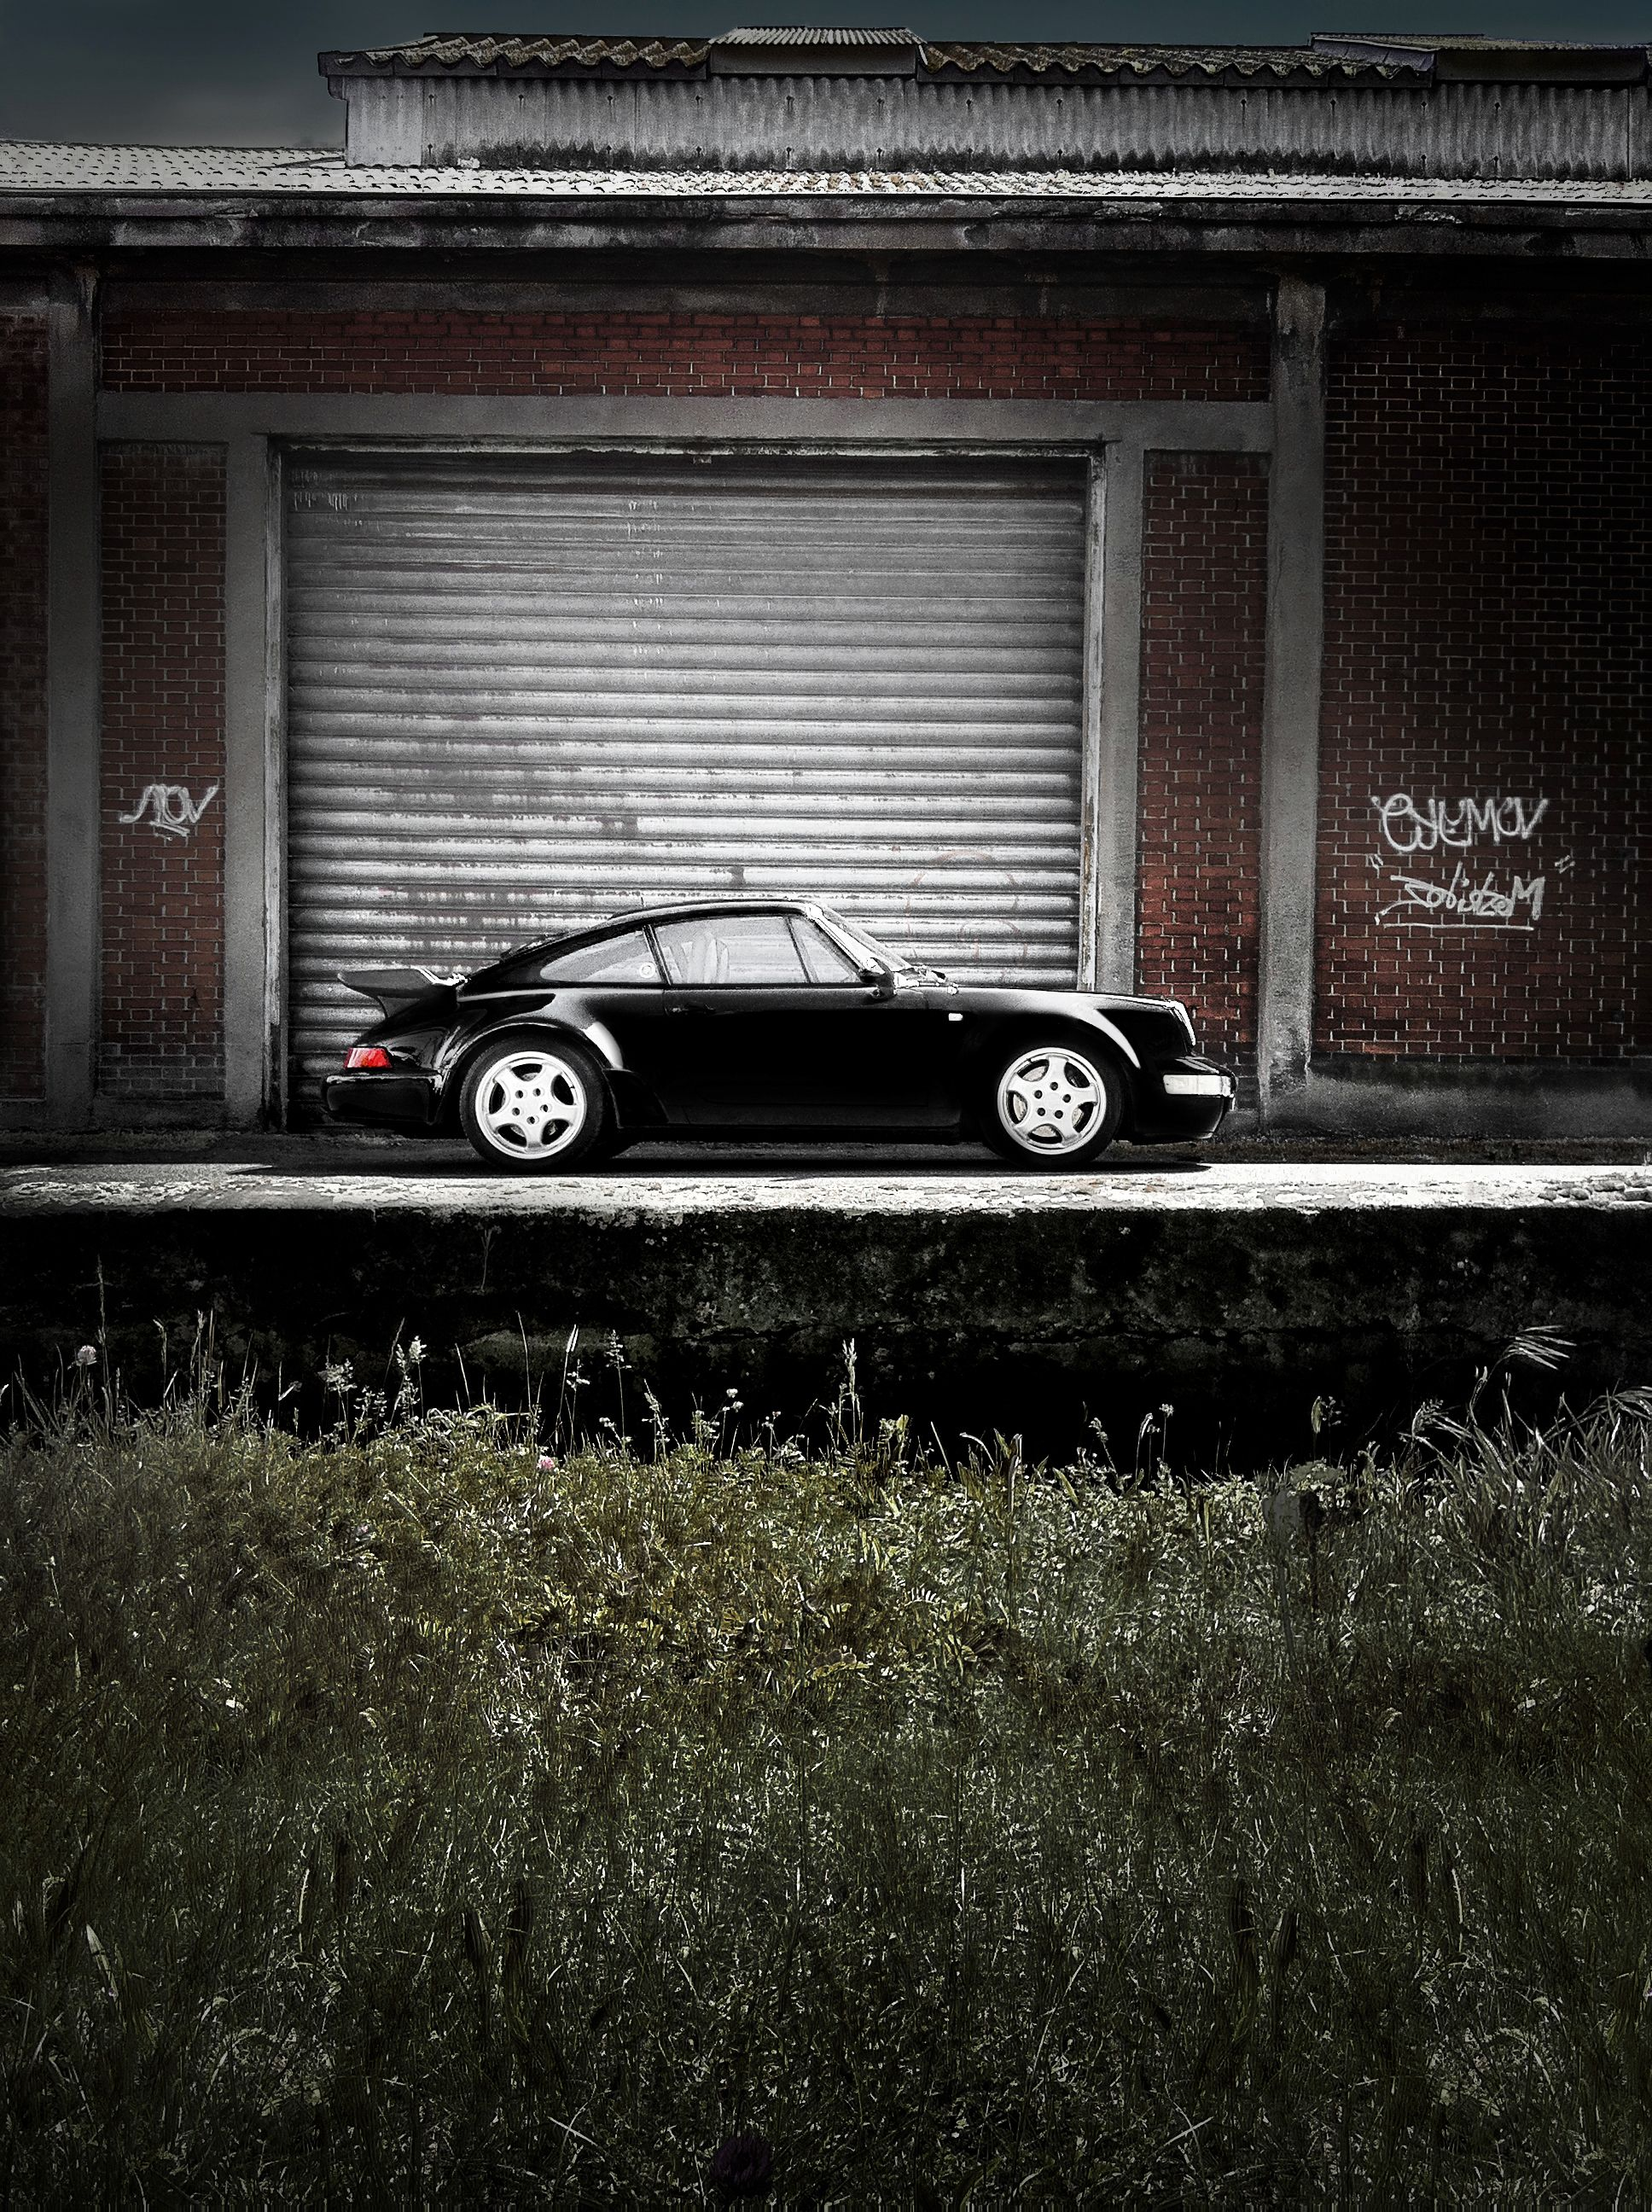 Porsche 964 Turbo S Ii 965 Porsche 964 Car Photography Turbo S